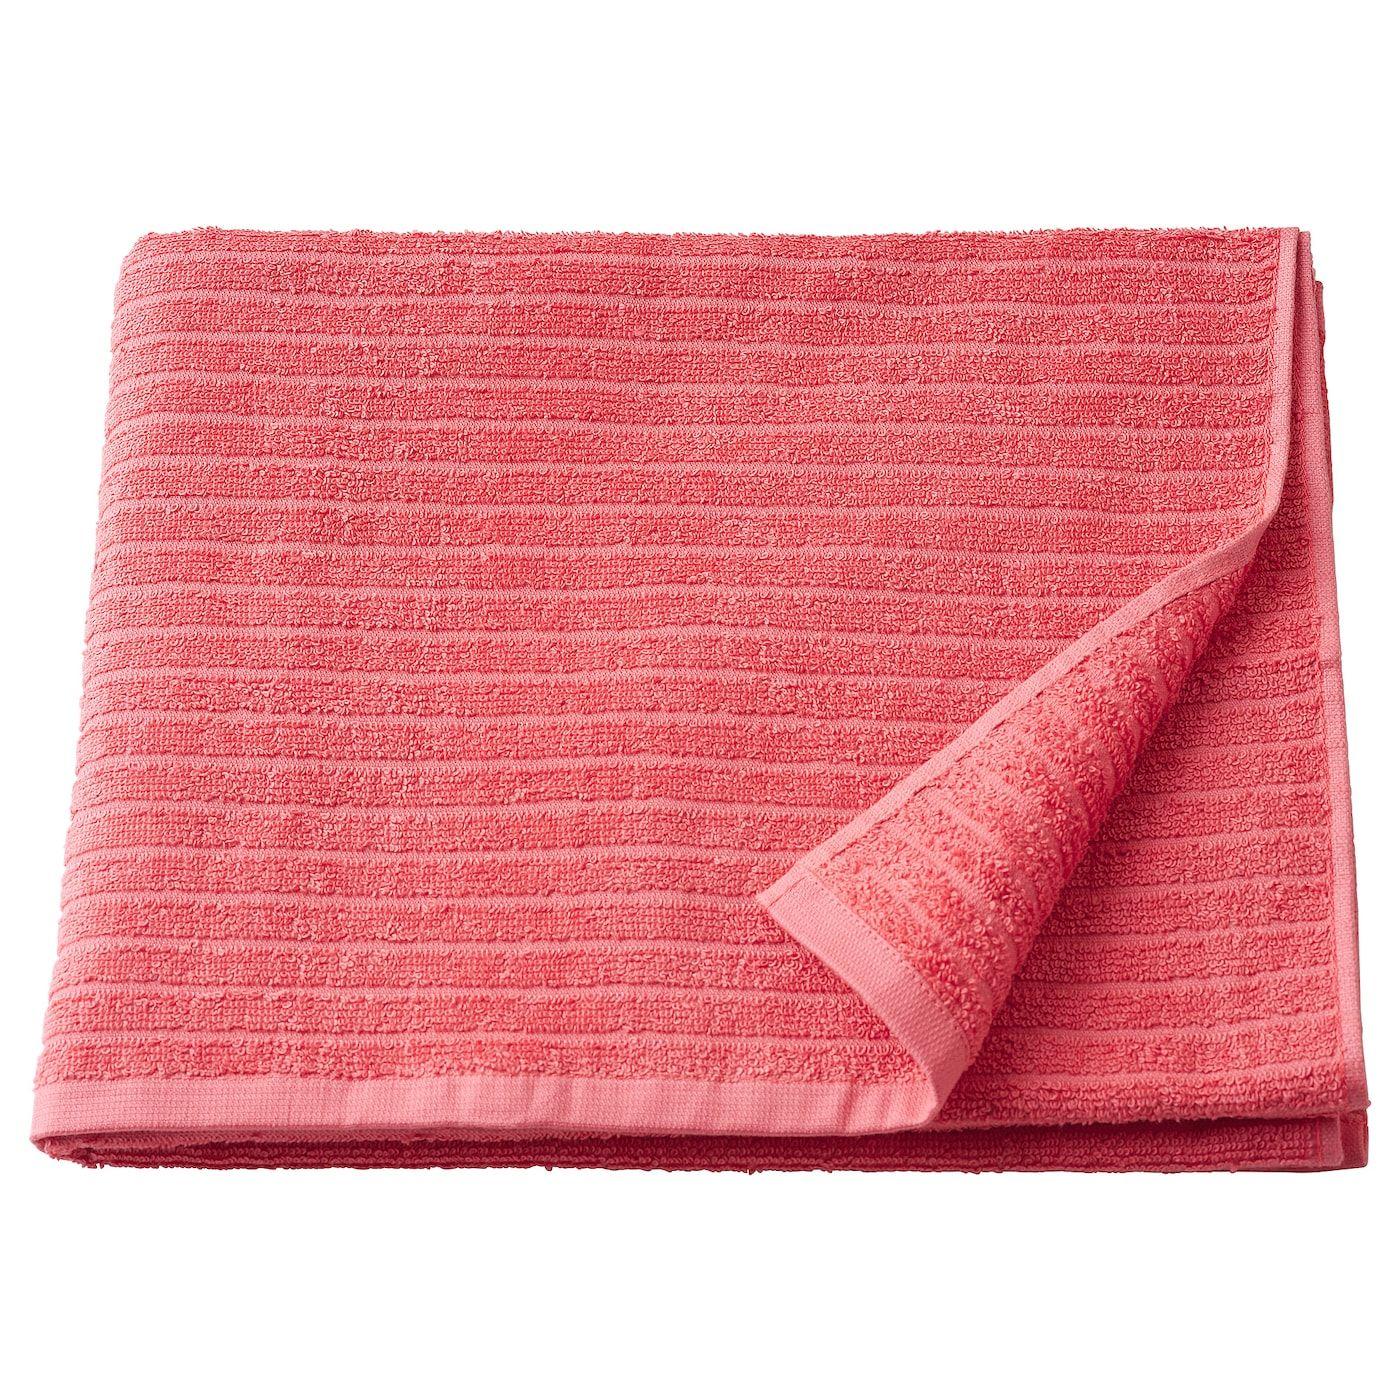 Vagsjon Bath Towel Light Red 28x55 70x140 Cm Bath Towels